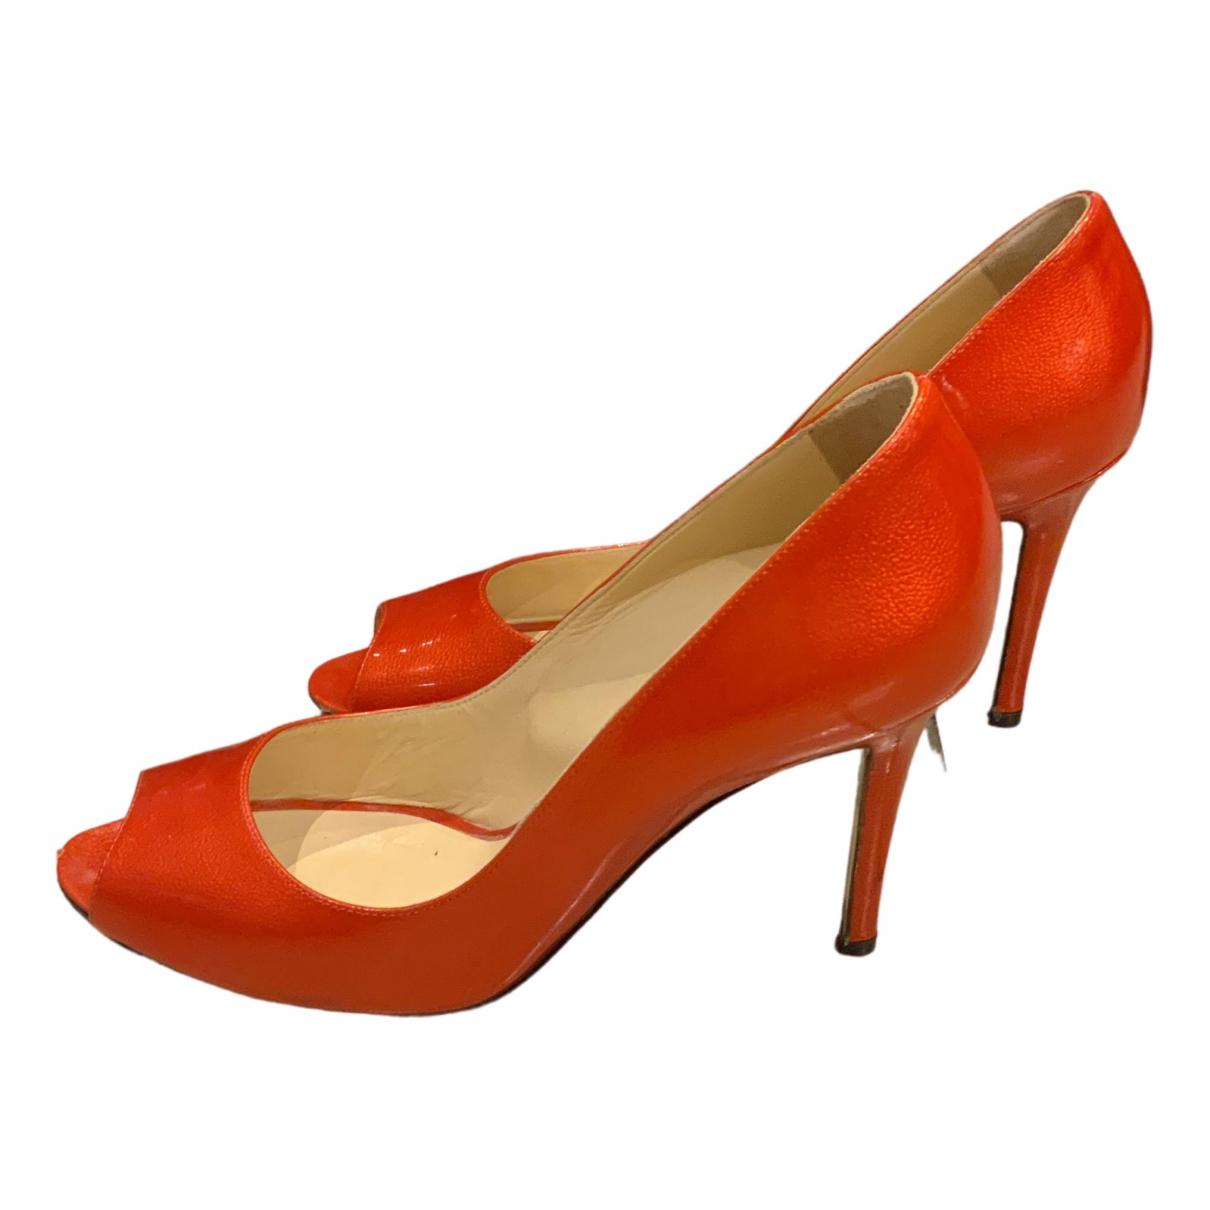 Sergio Rossi N Orange Patent leather Heels for Women 40 EU